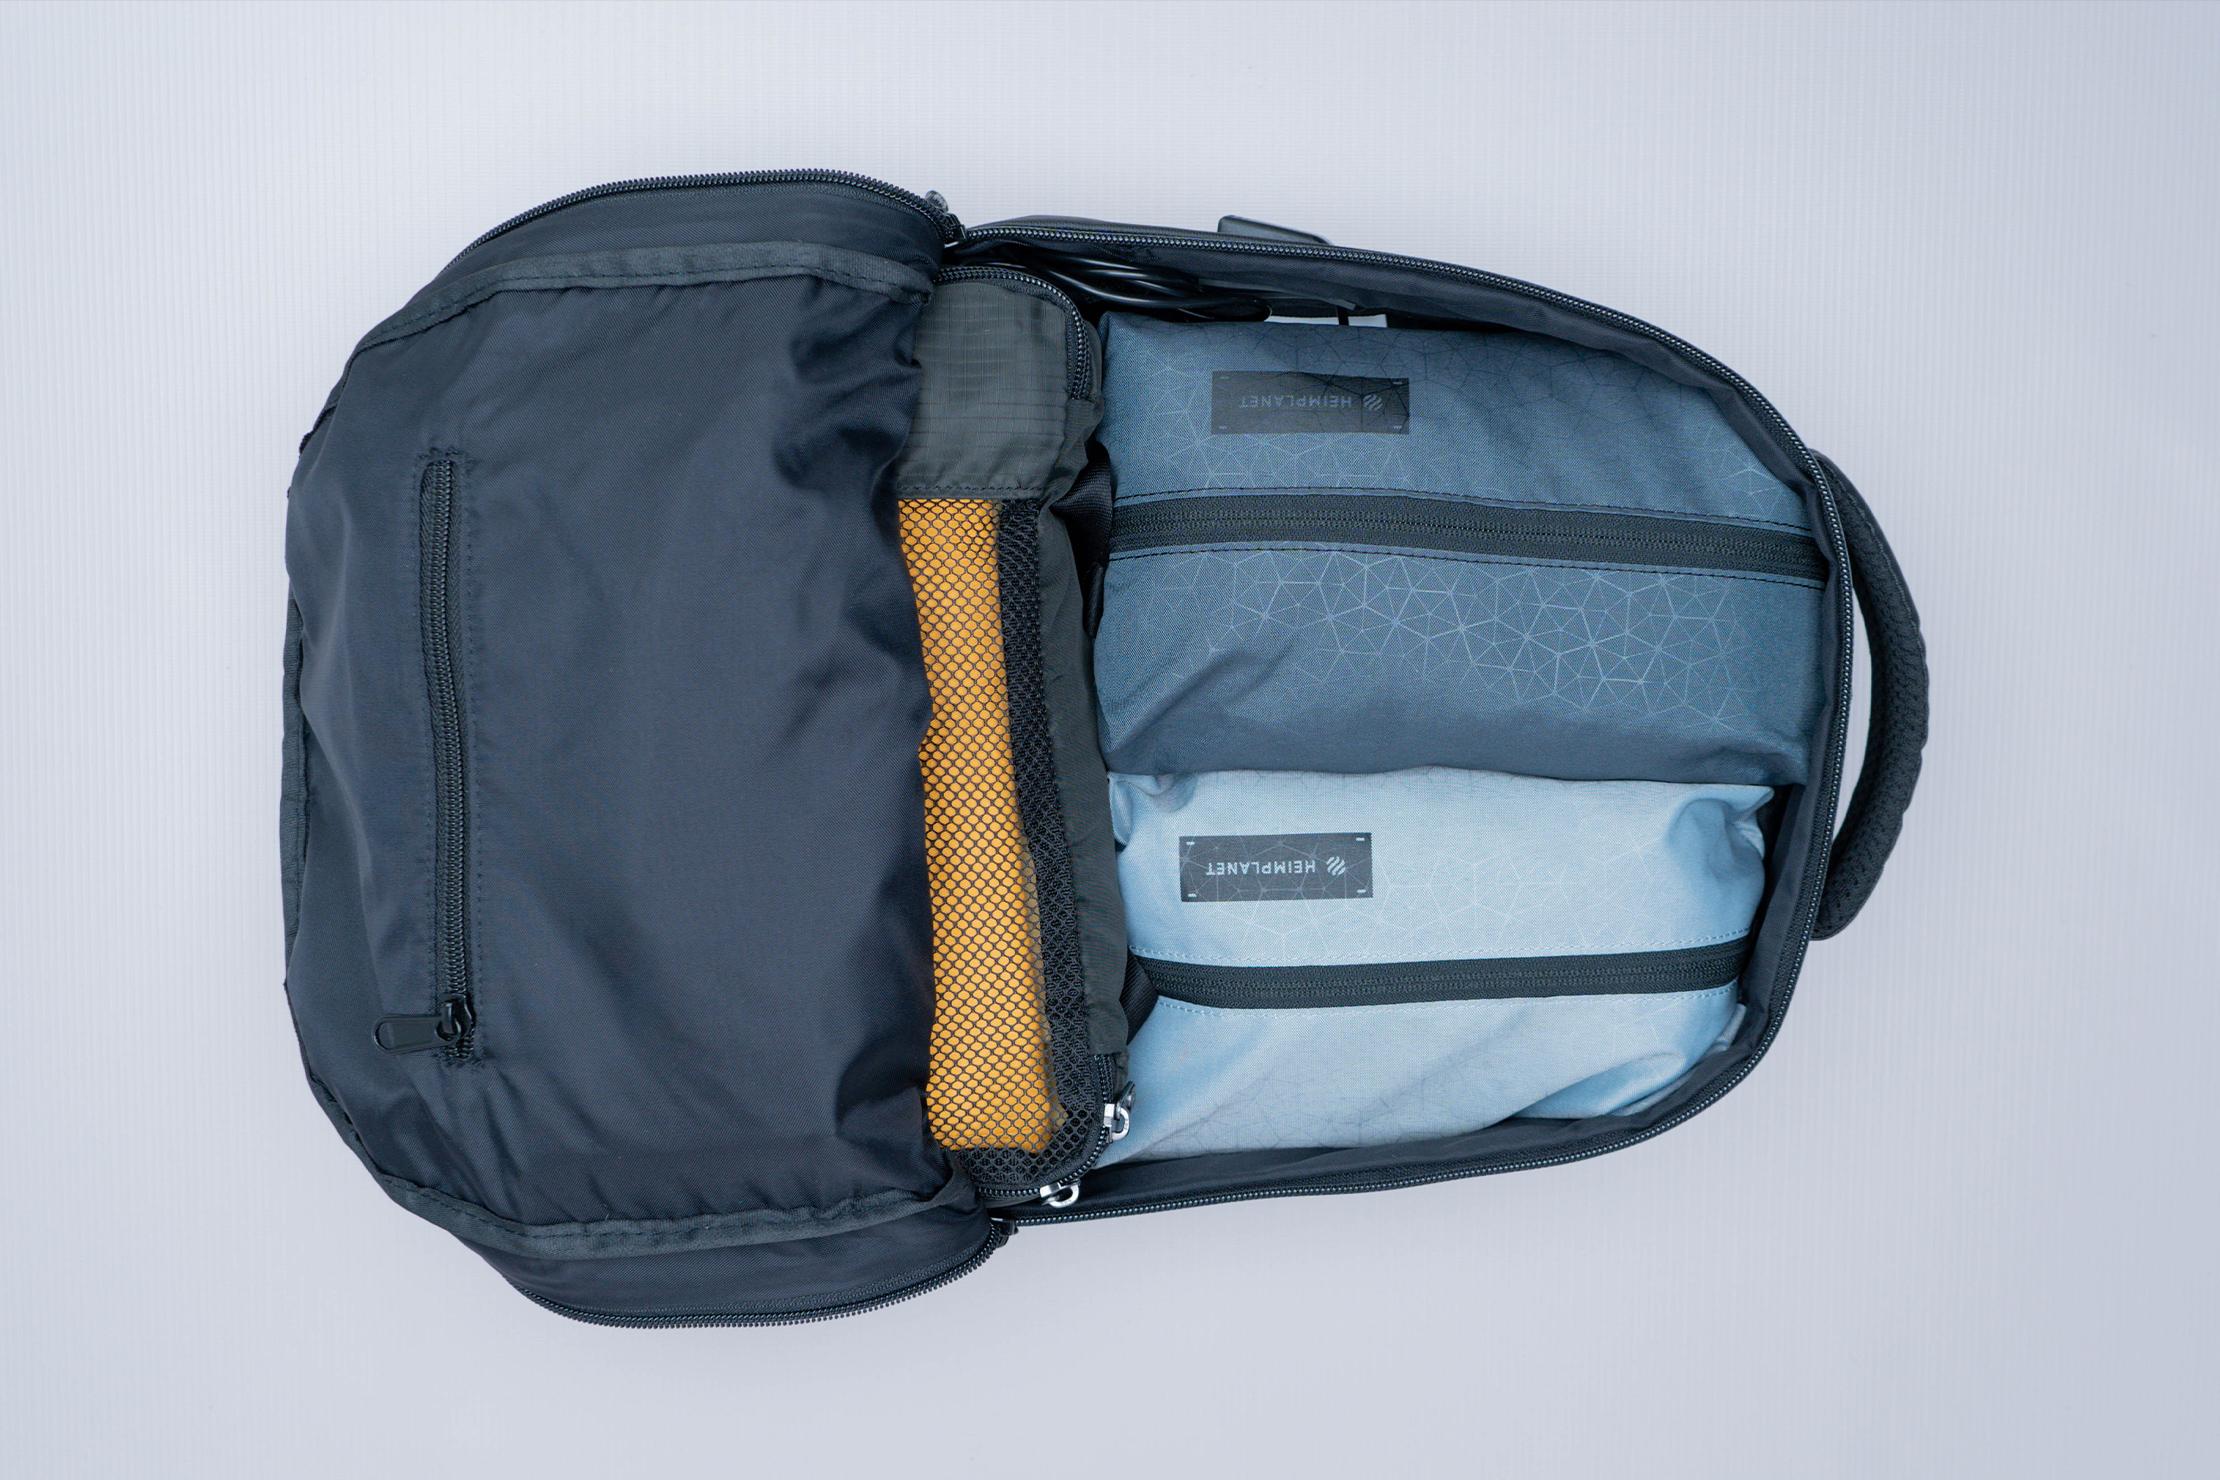 The Ridge Classic Backpack Weatherproof Top View Inside Pocket